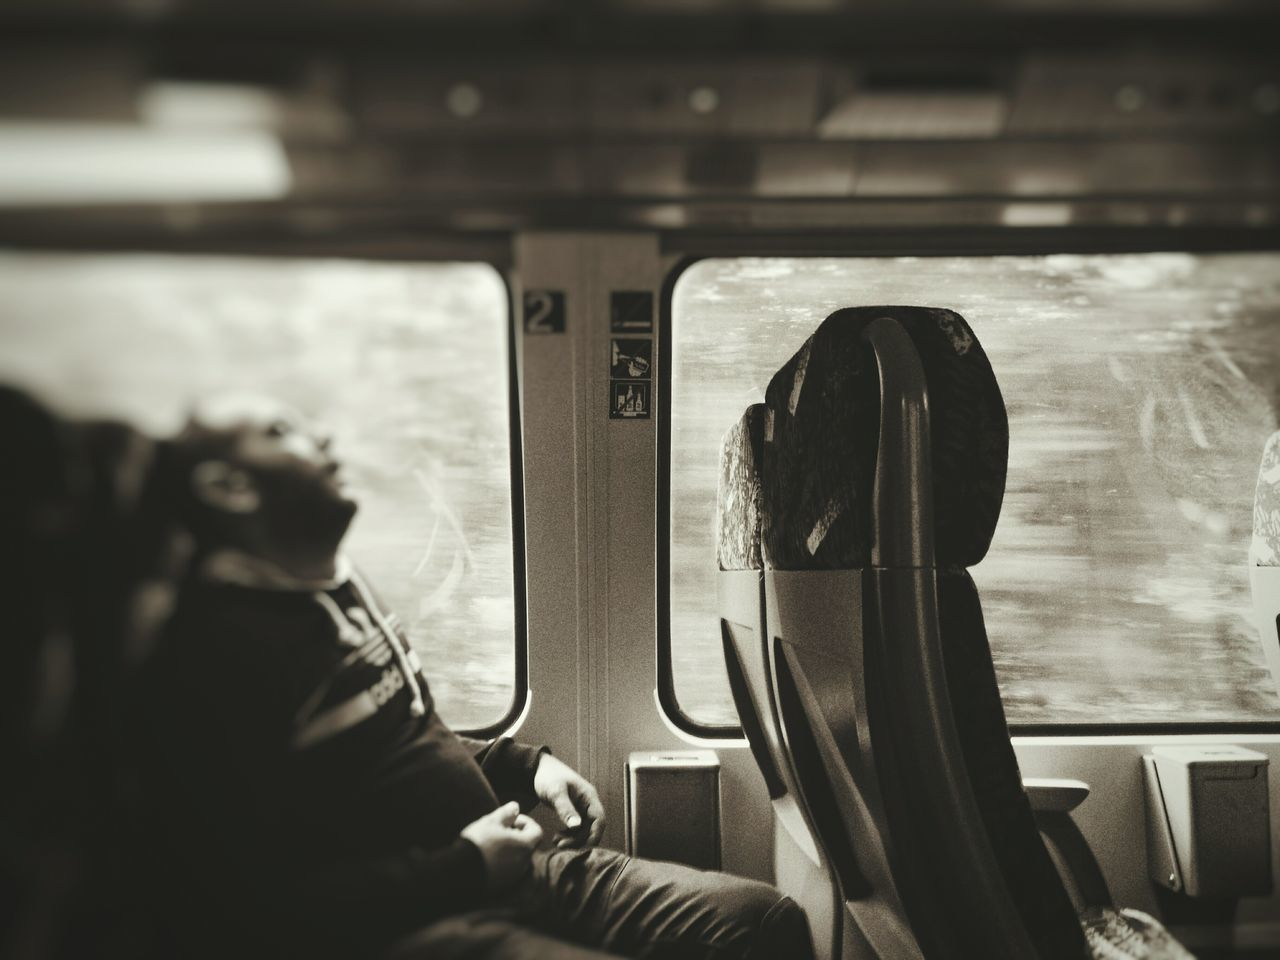 Sleeping Trainsleep Snoring Snoring Like A Train Hamburg Metronome